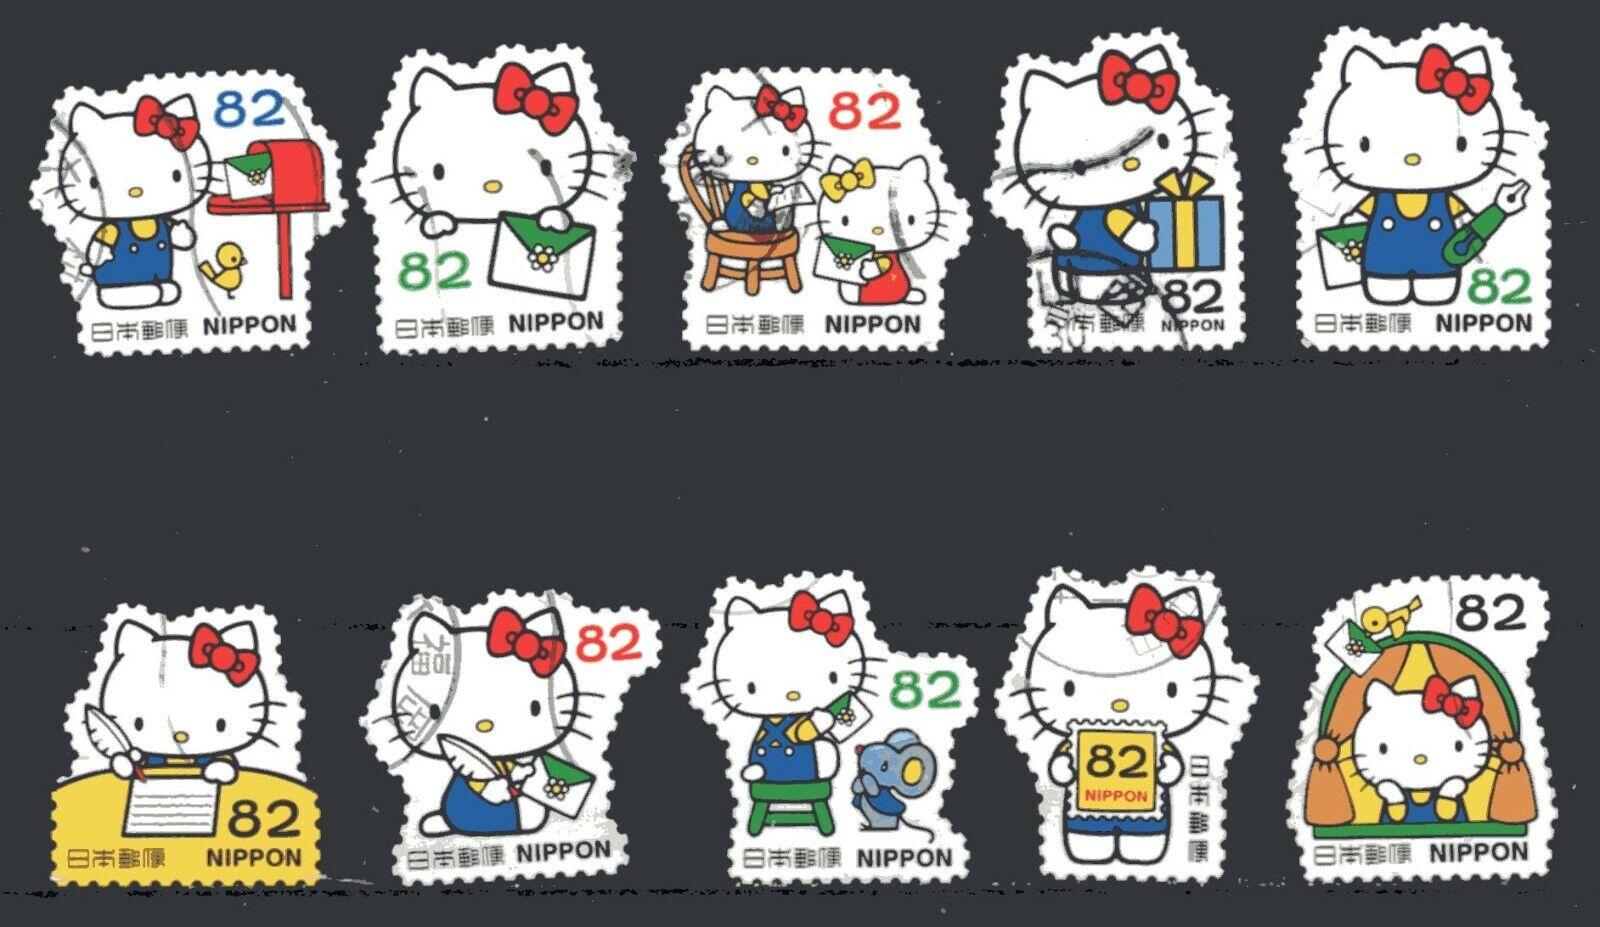 Japan 2018 82 Hello Kitty, SC 4207a-j , Gestempelt - $1.00